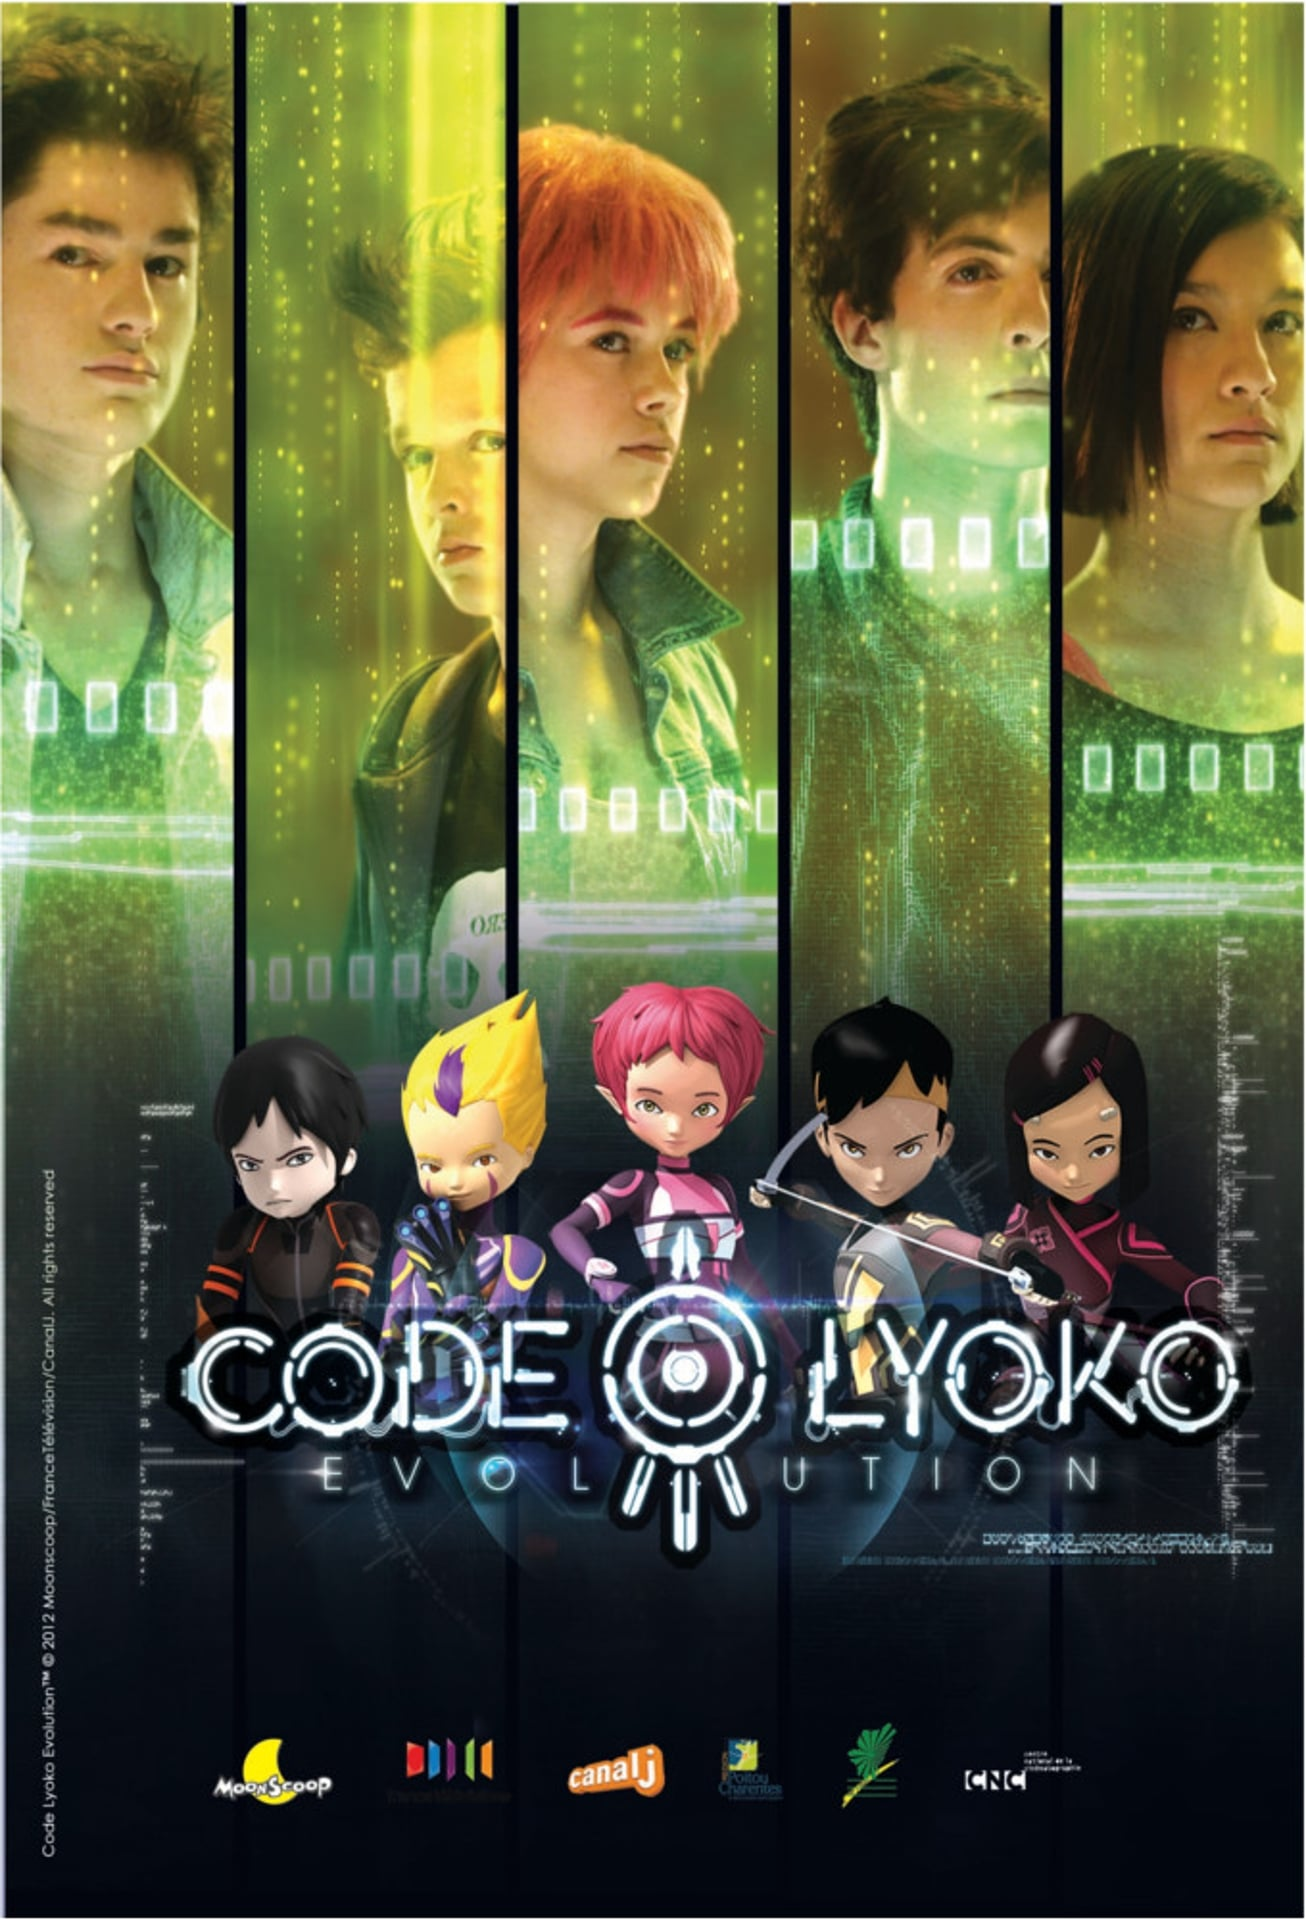 Code Lyoko Évolution (2012)